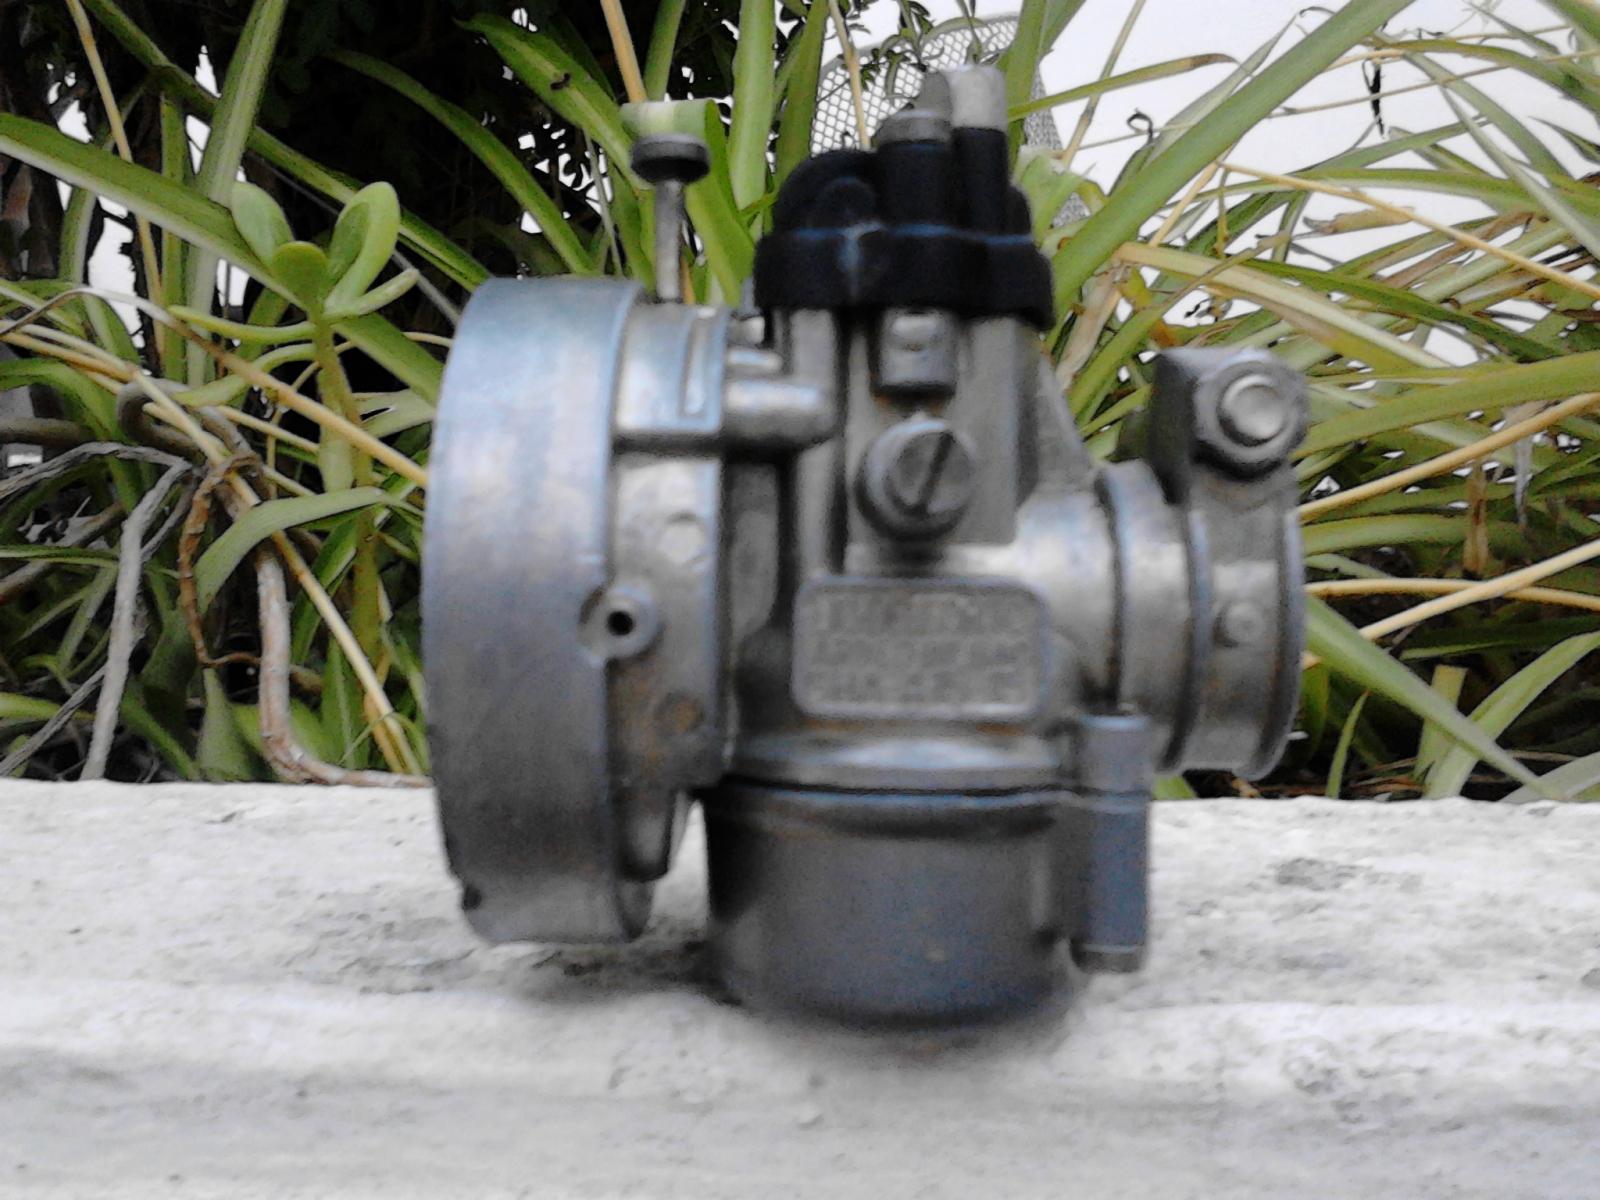 Puch Varias - Carburador Dellorto SHA-A 15-15 A26uc0